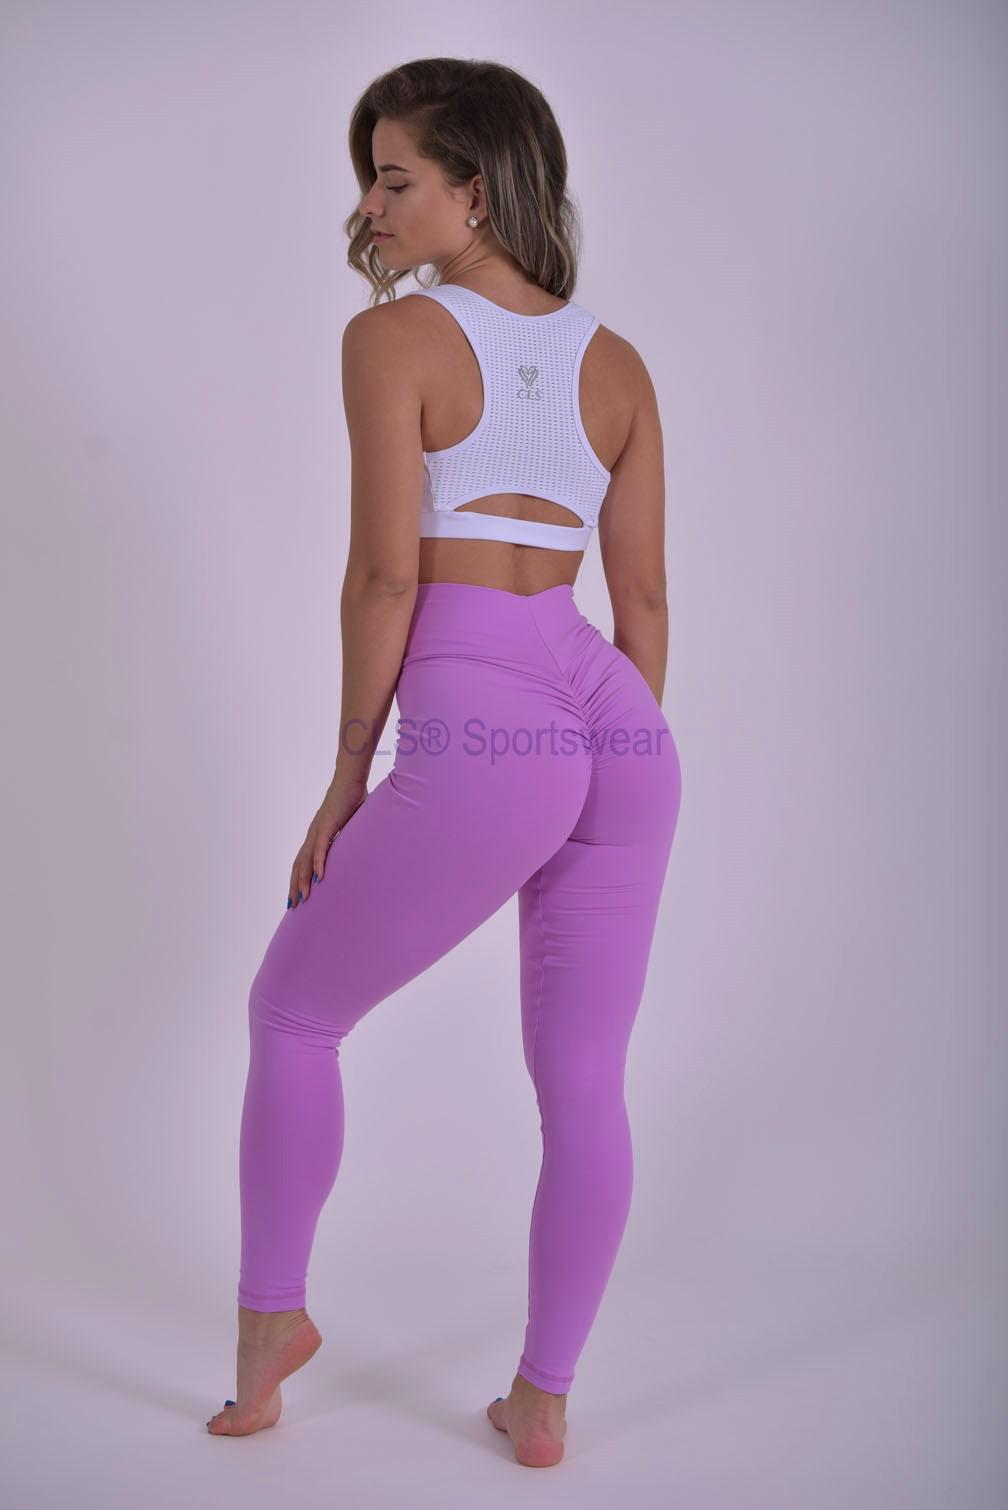 515be22310482 CLS Sportswear - Leggings, Scrunch Butt, Yoga Pants, Tights